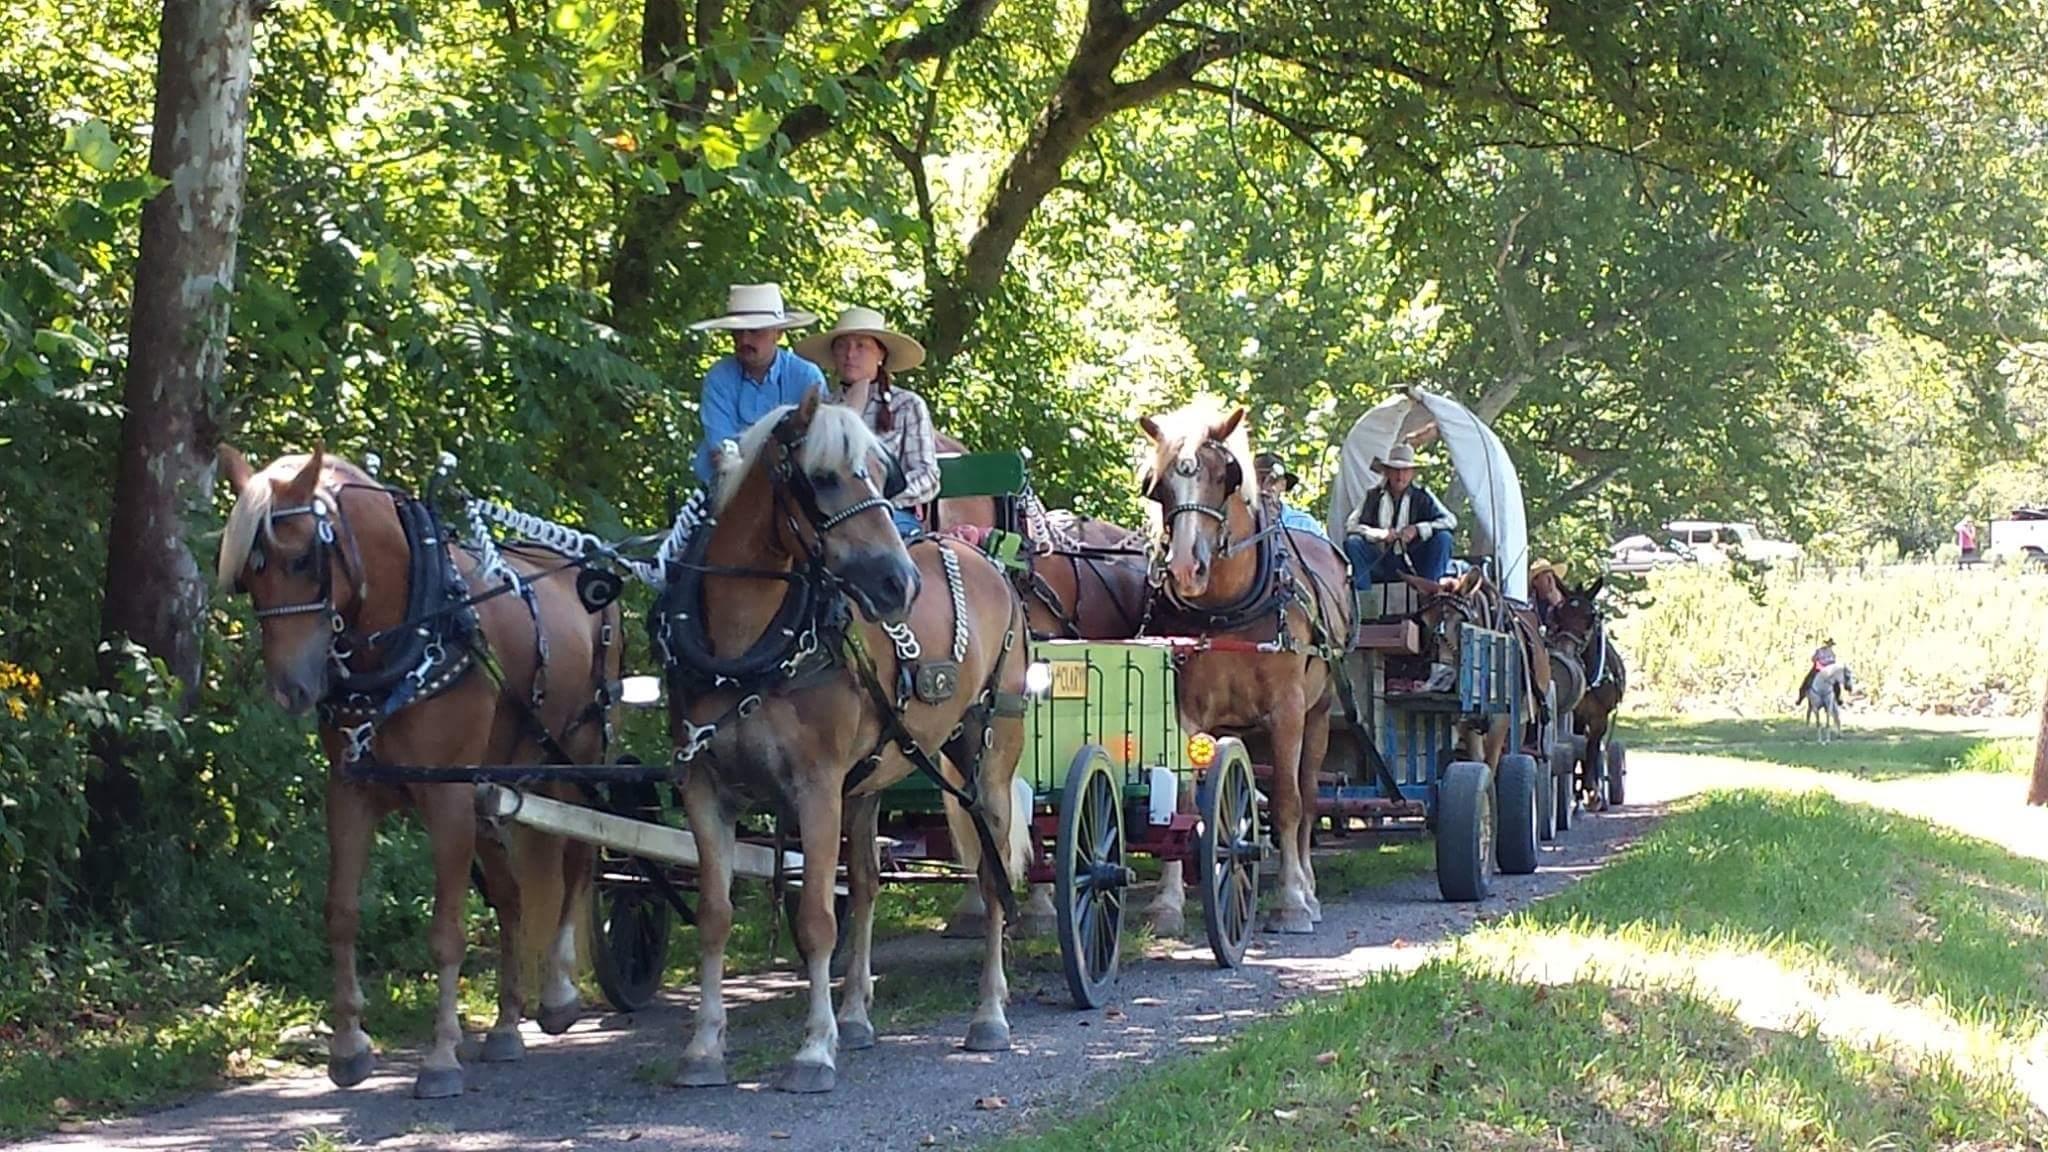 2015 County Bicentennial Wagon Train